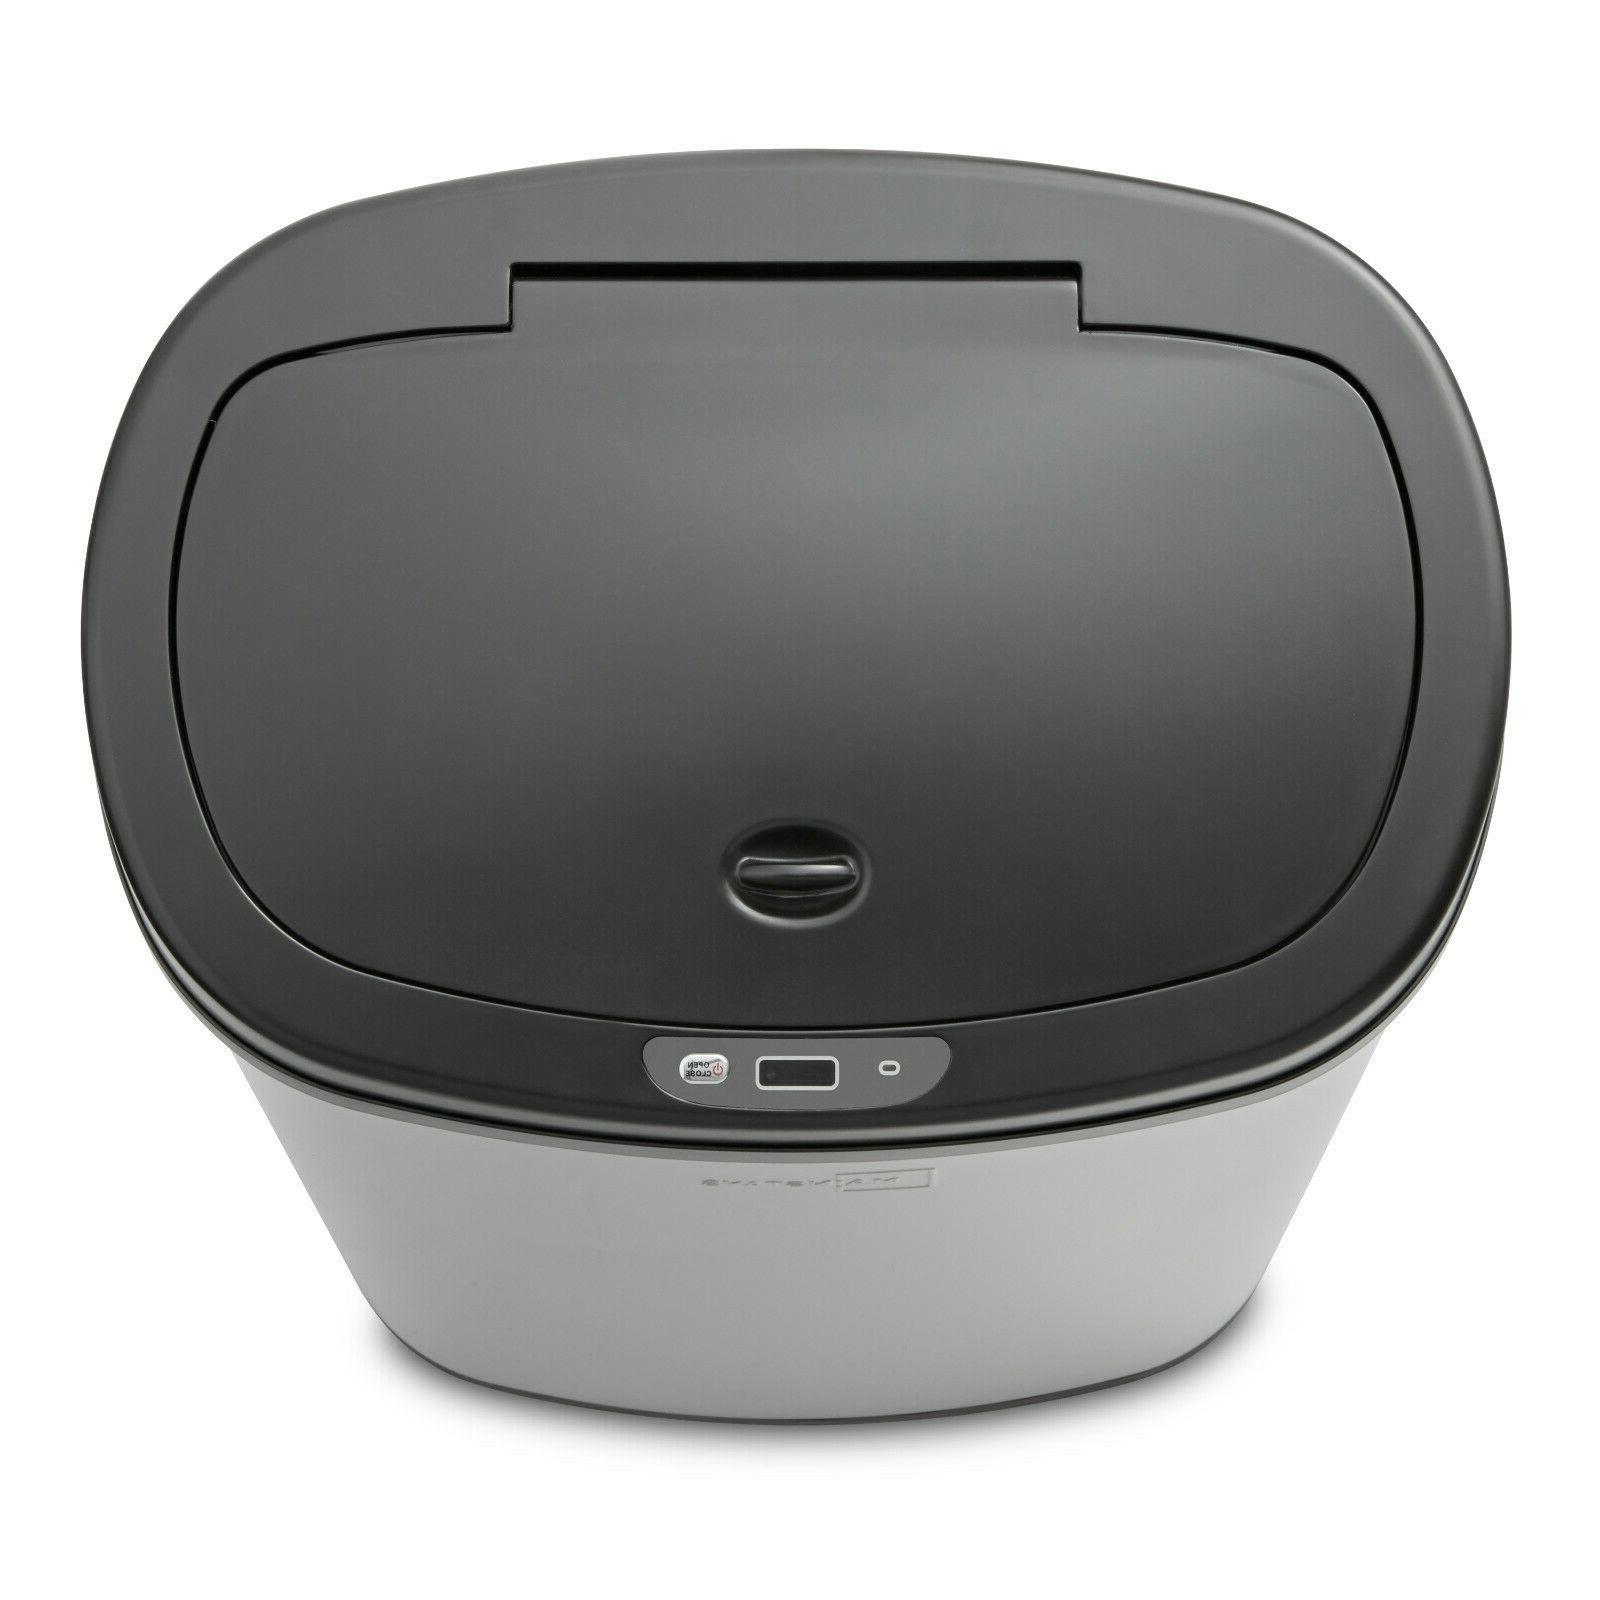 Kitchen Can 13.2 Motion Sensor Hands Open